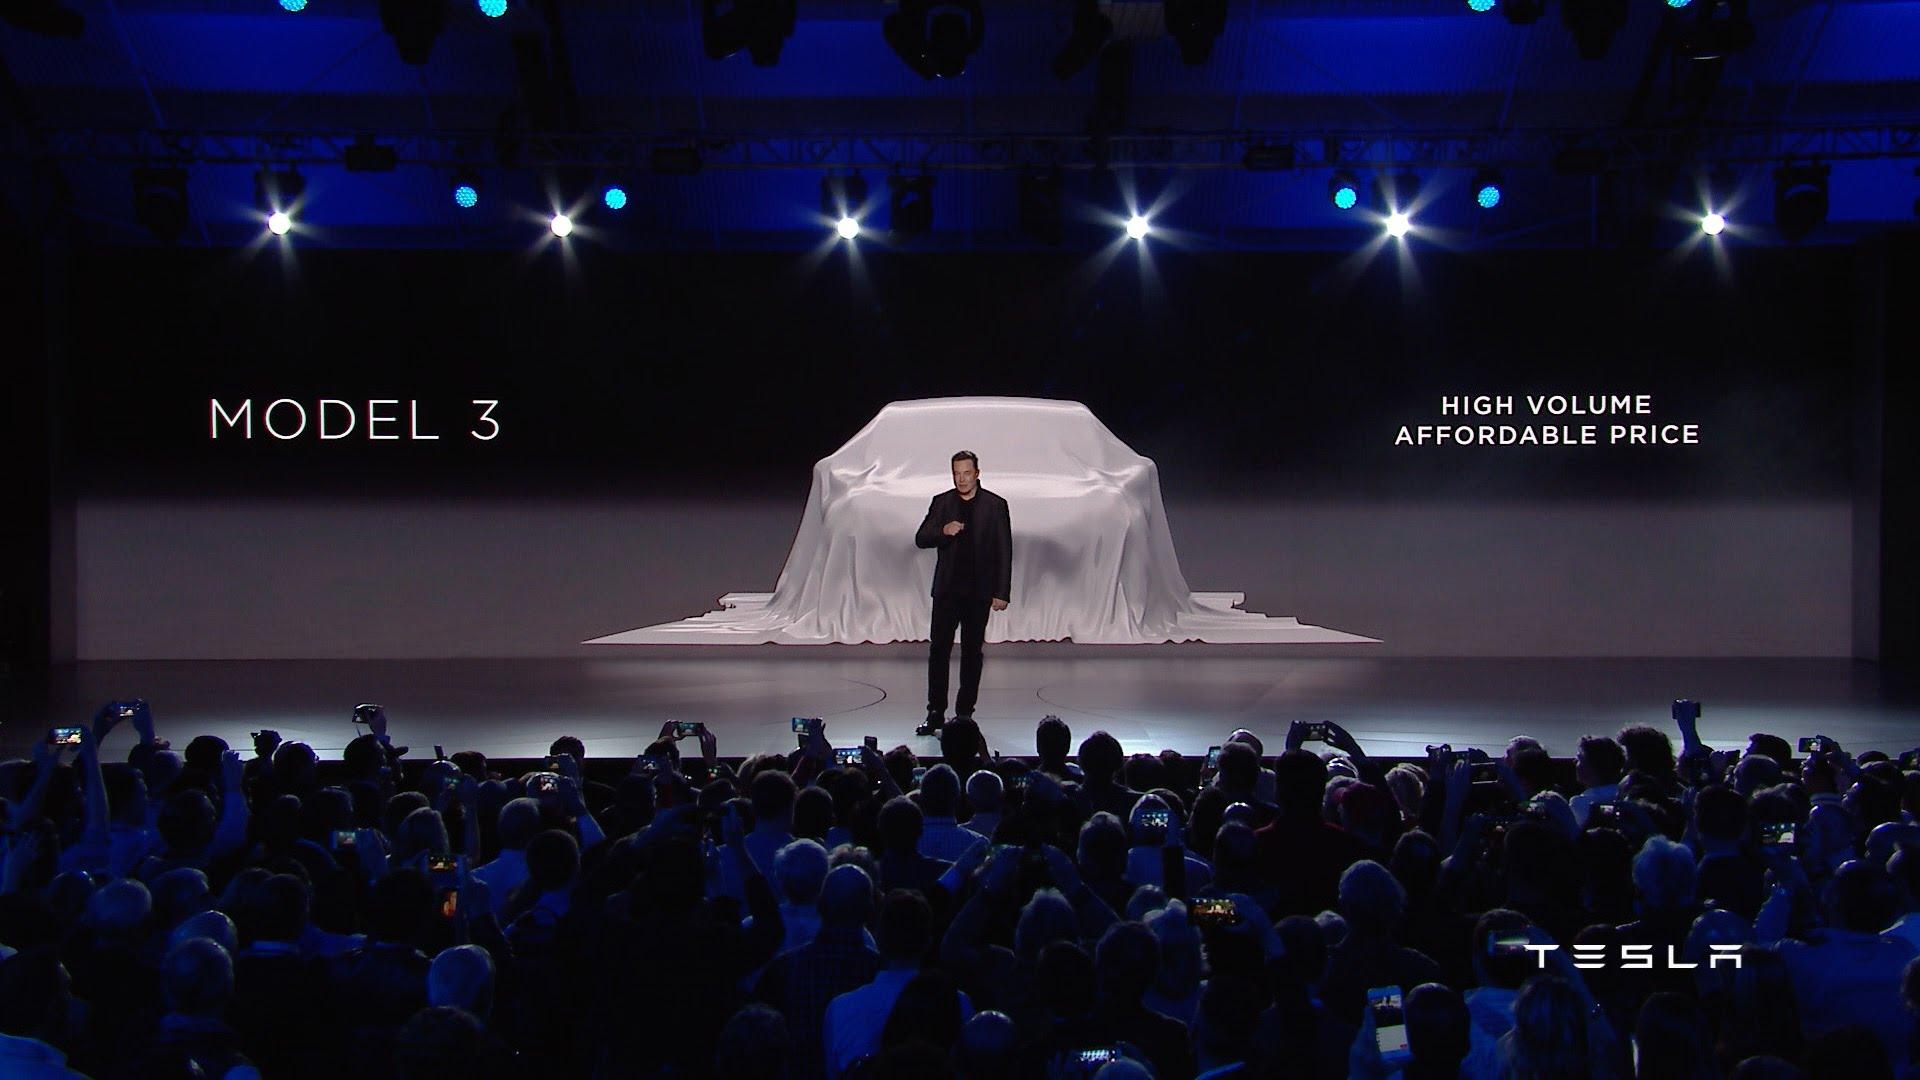 iPhone-Stalking Elon Musk's Tesla Model 3 Launch | AIChE